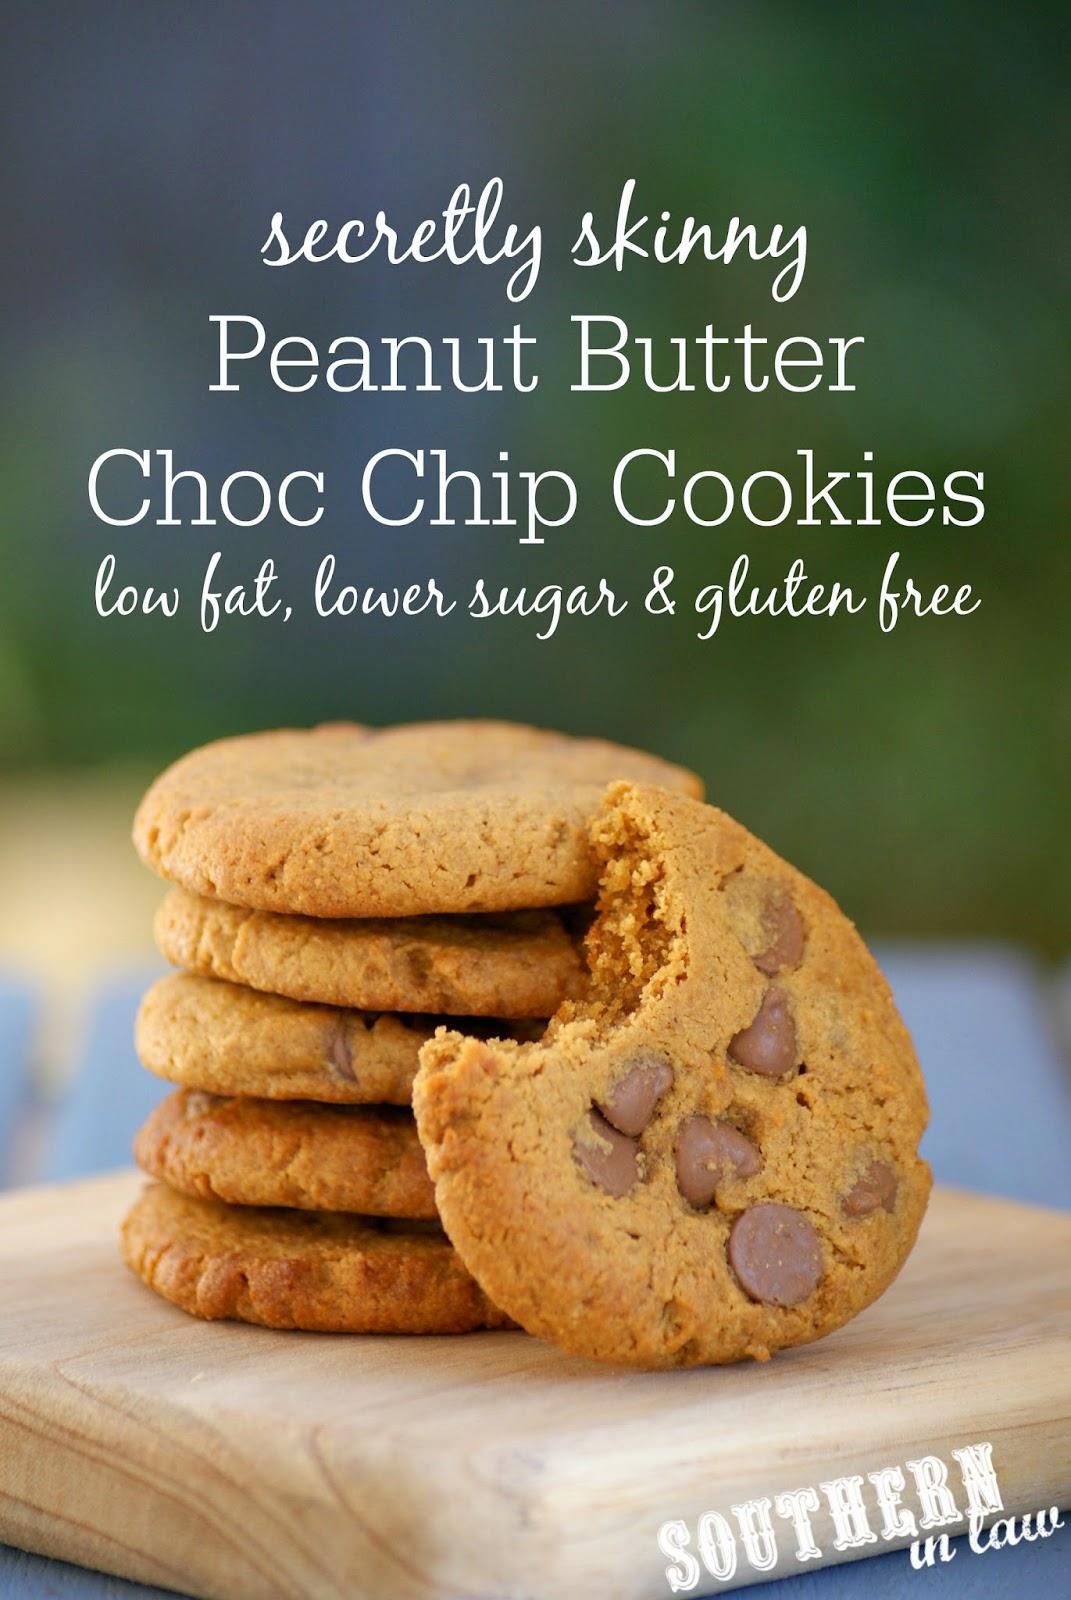 Secretly Skinny Peanut Butter Chocolate Chip Cookie Recipe - low fat, gluten free, healthy, low sugar - Peanut Flour Cookies Recipe